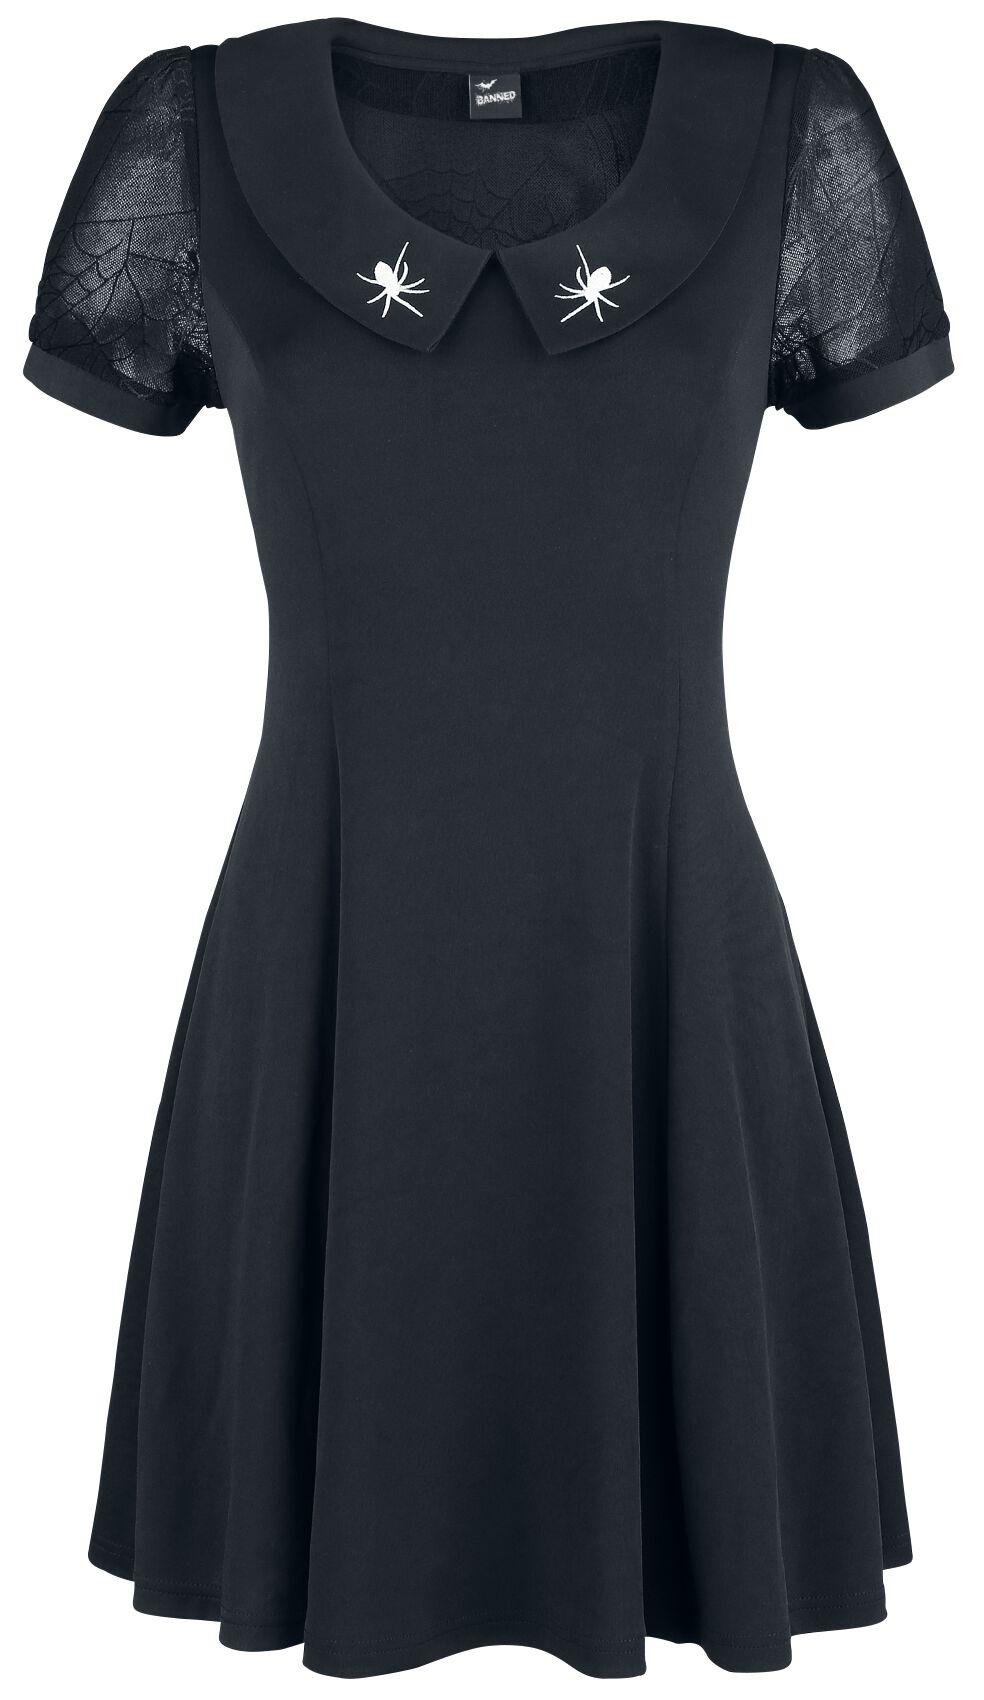 Image of   Banned Laced Dress Kjole sort